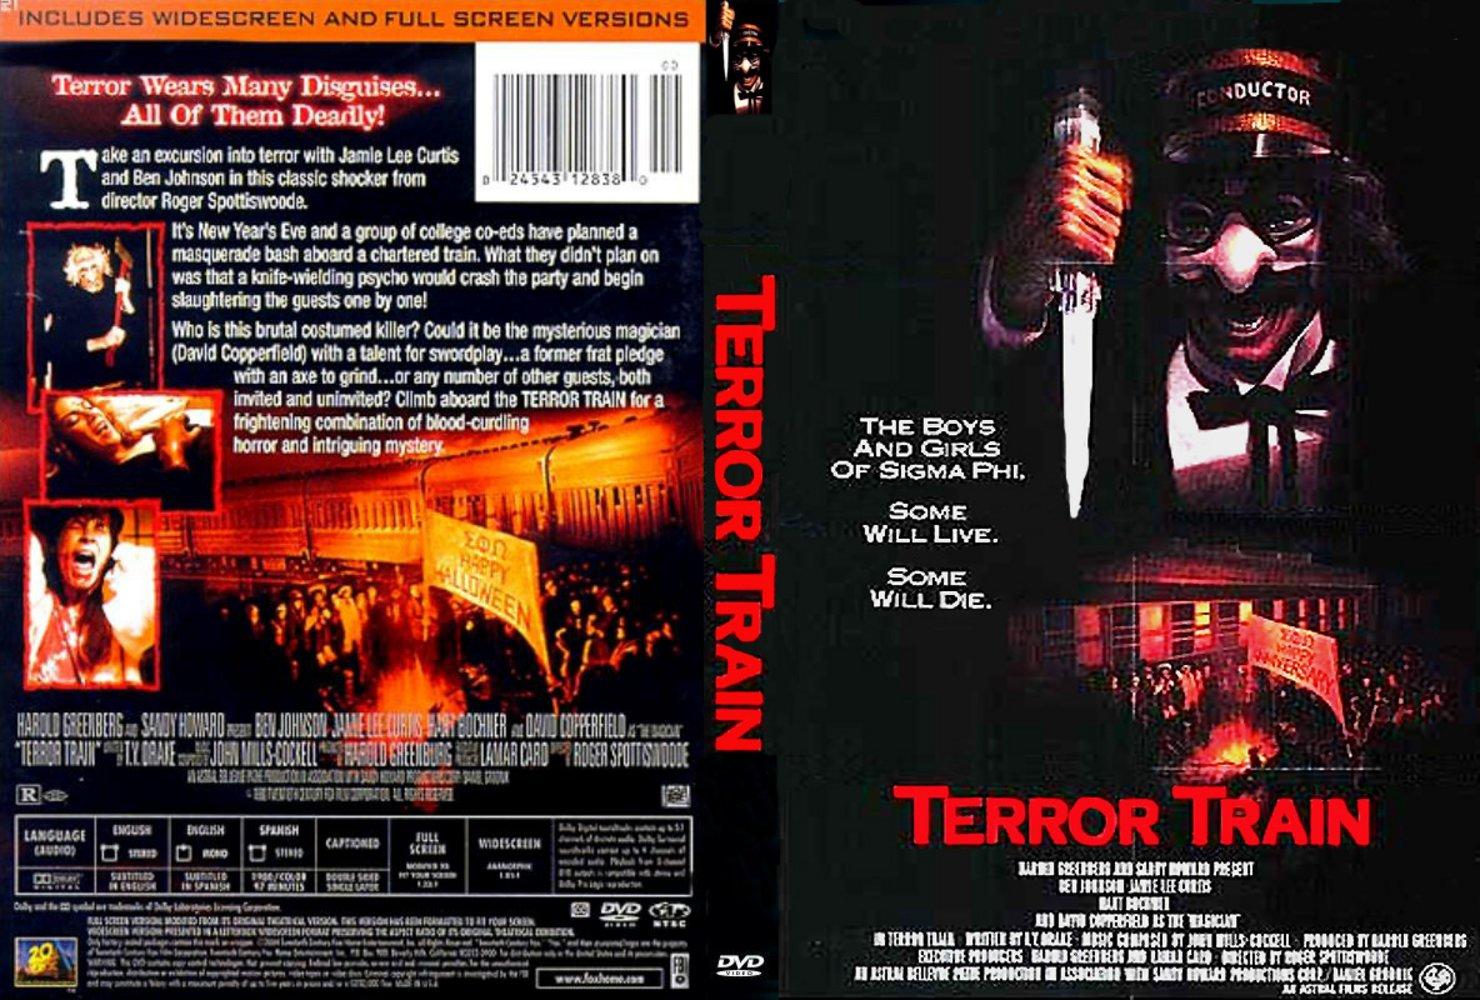 terror train blu ray wallpaper no 1 wallpaper hd